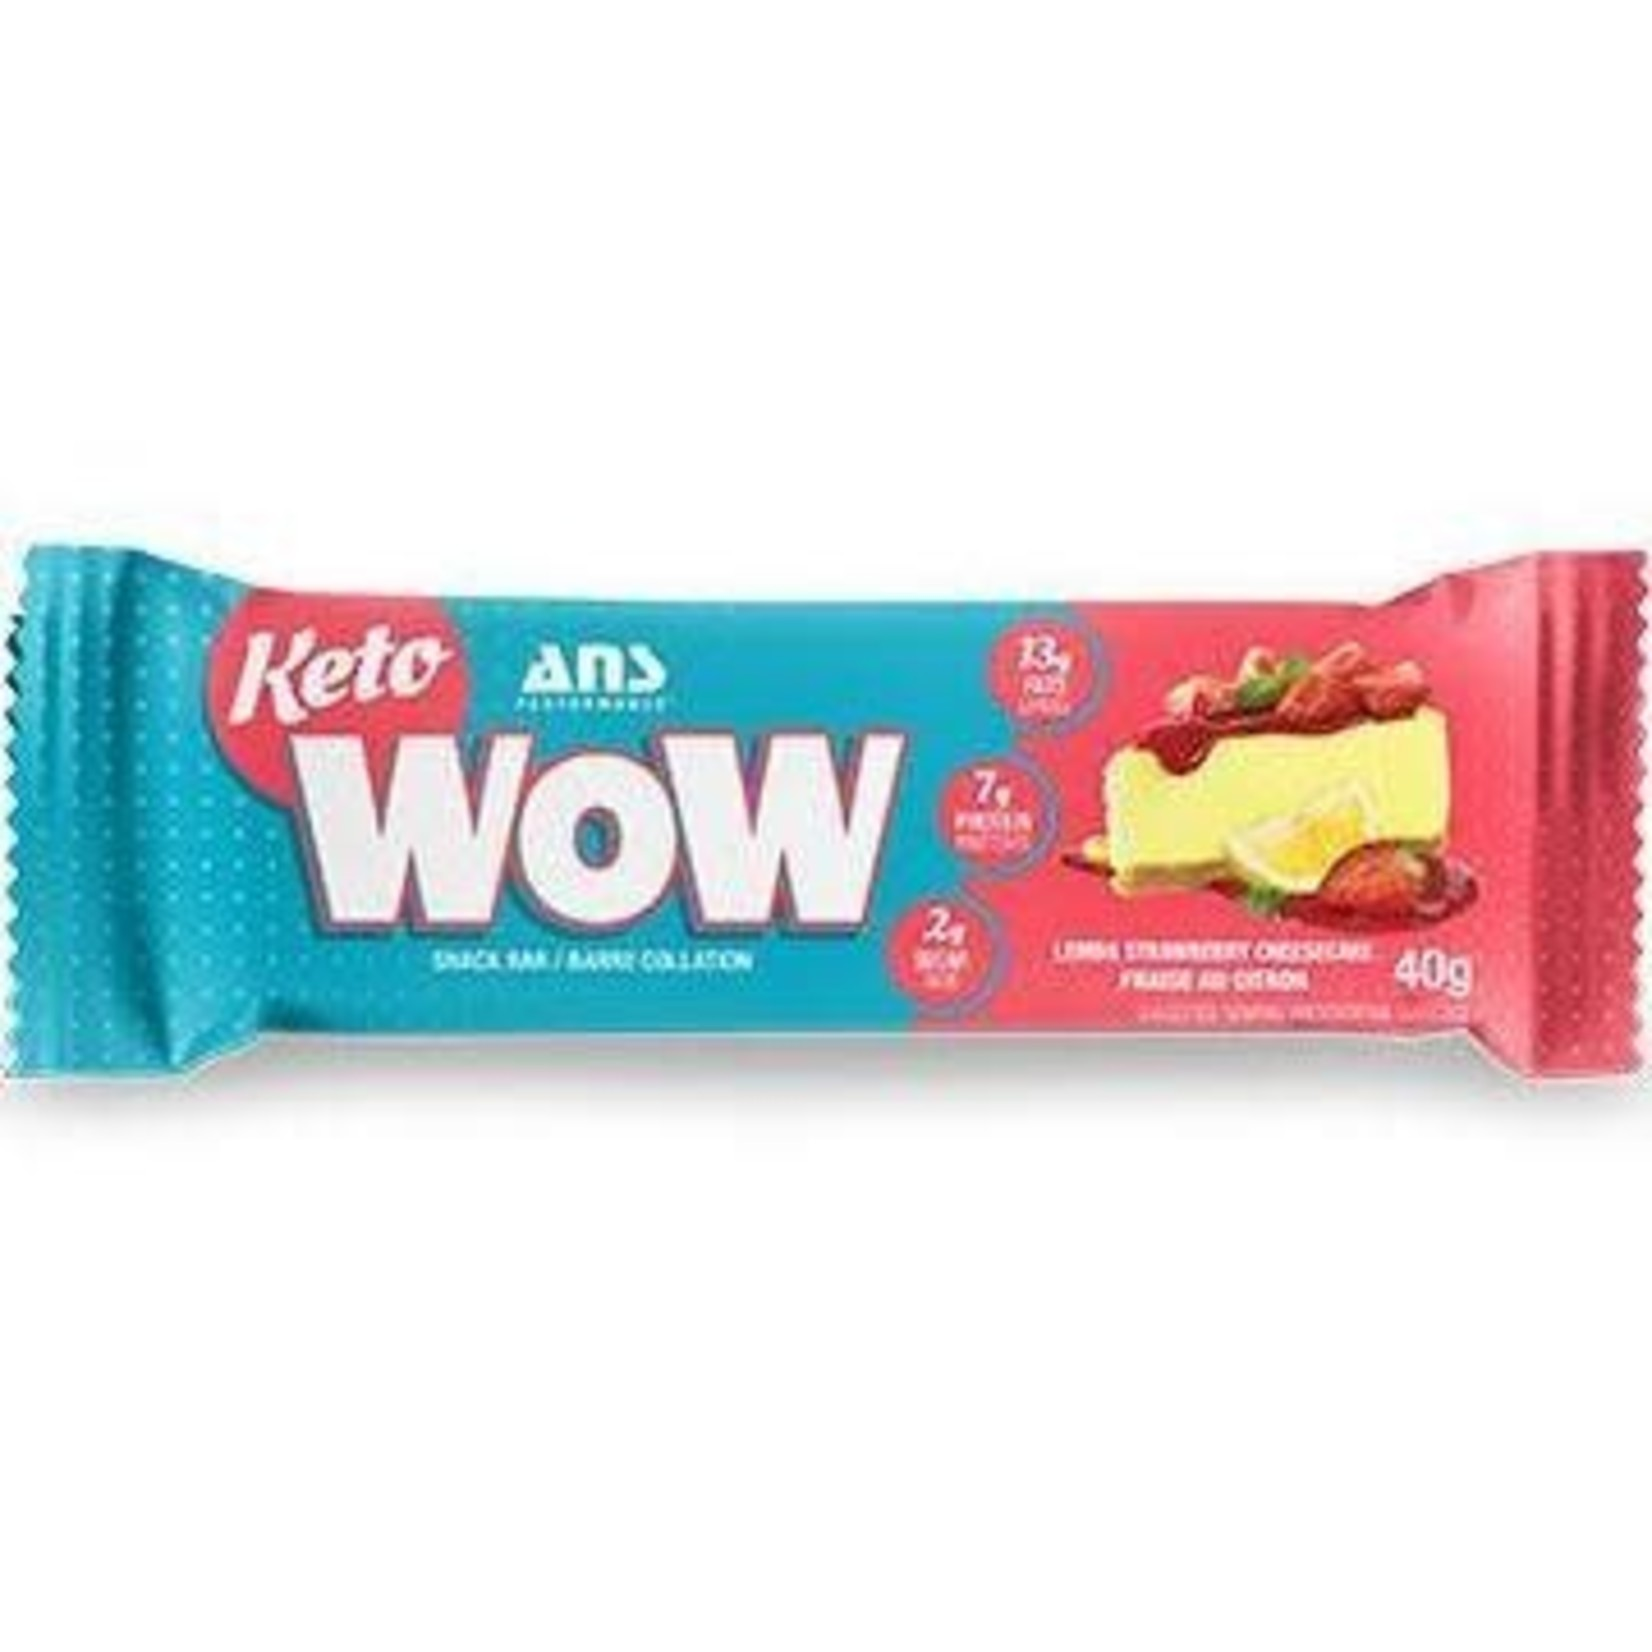 ANS ANS Keto WOW Lemon Strawberry Cheesecake Bar